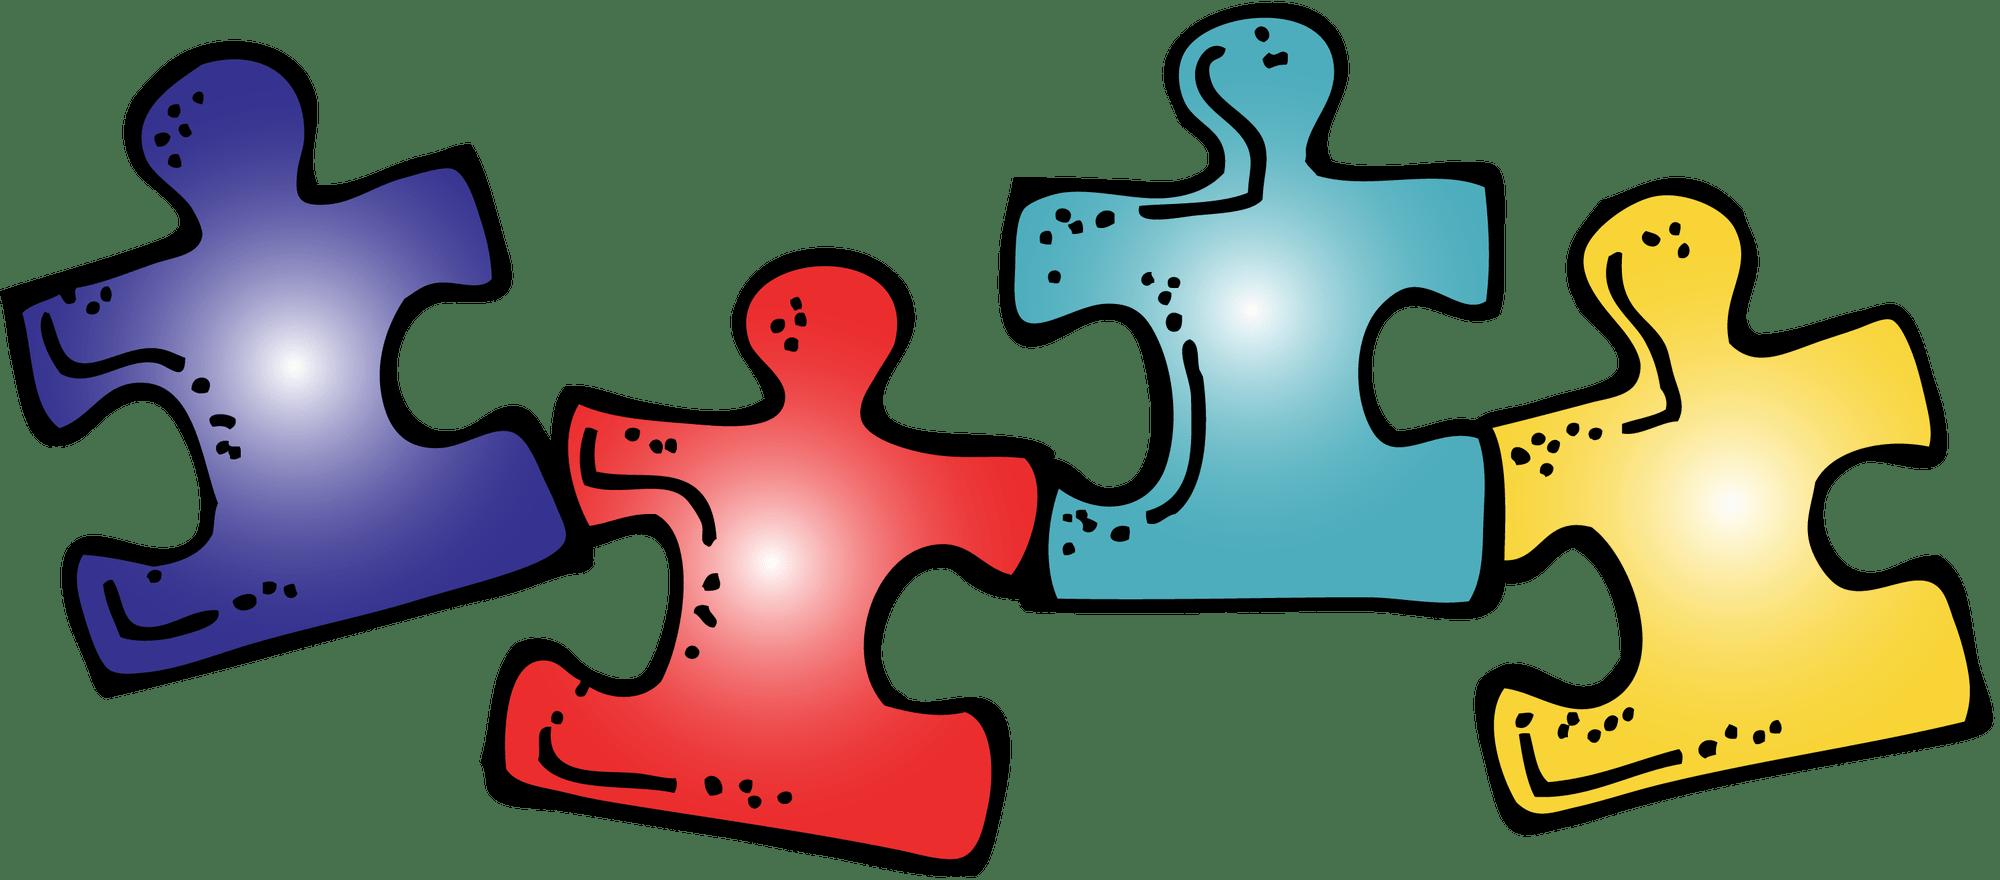 Symbol cliparts free download. Autism clipart characteristic